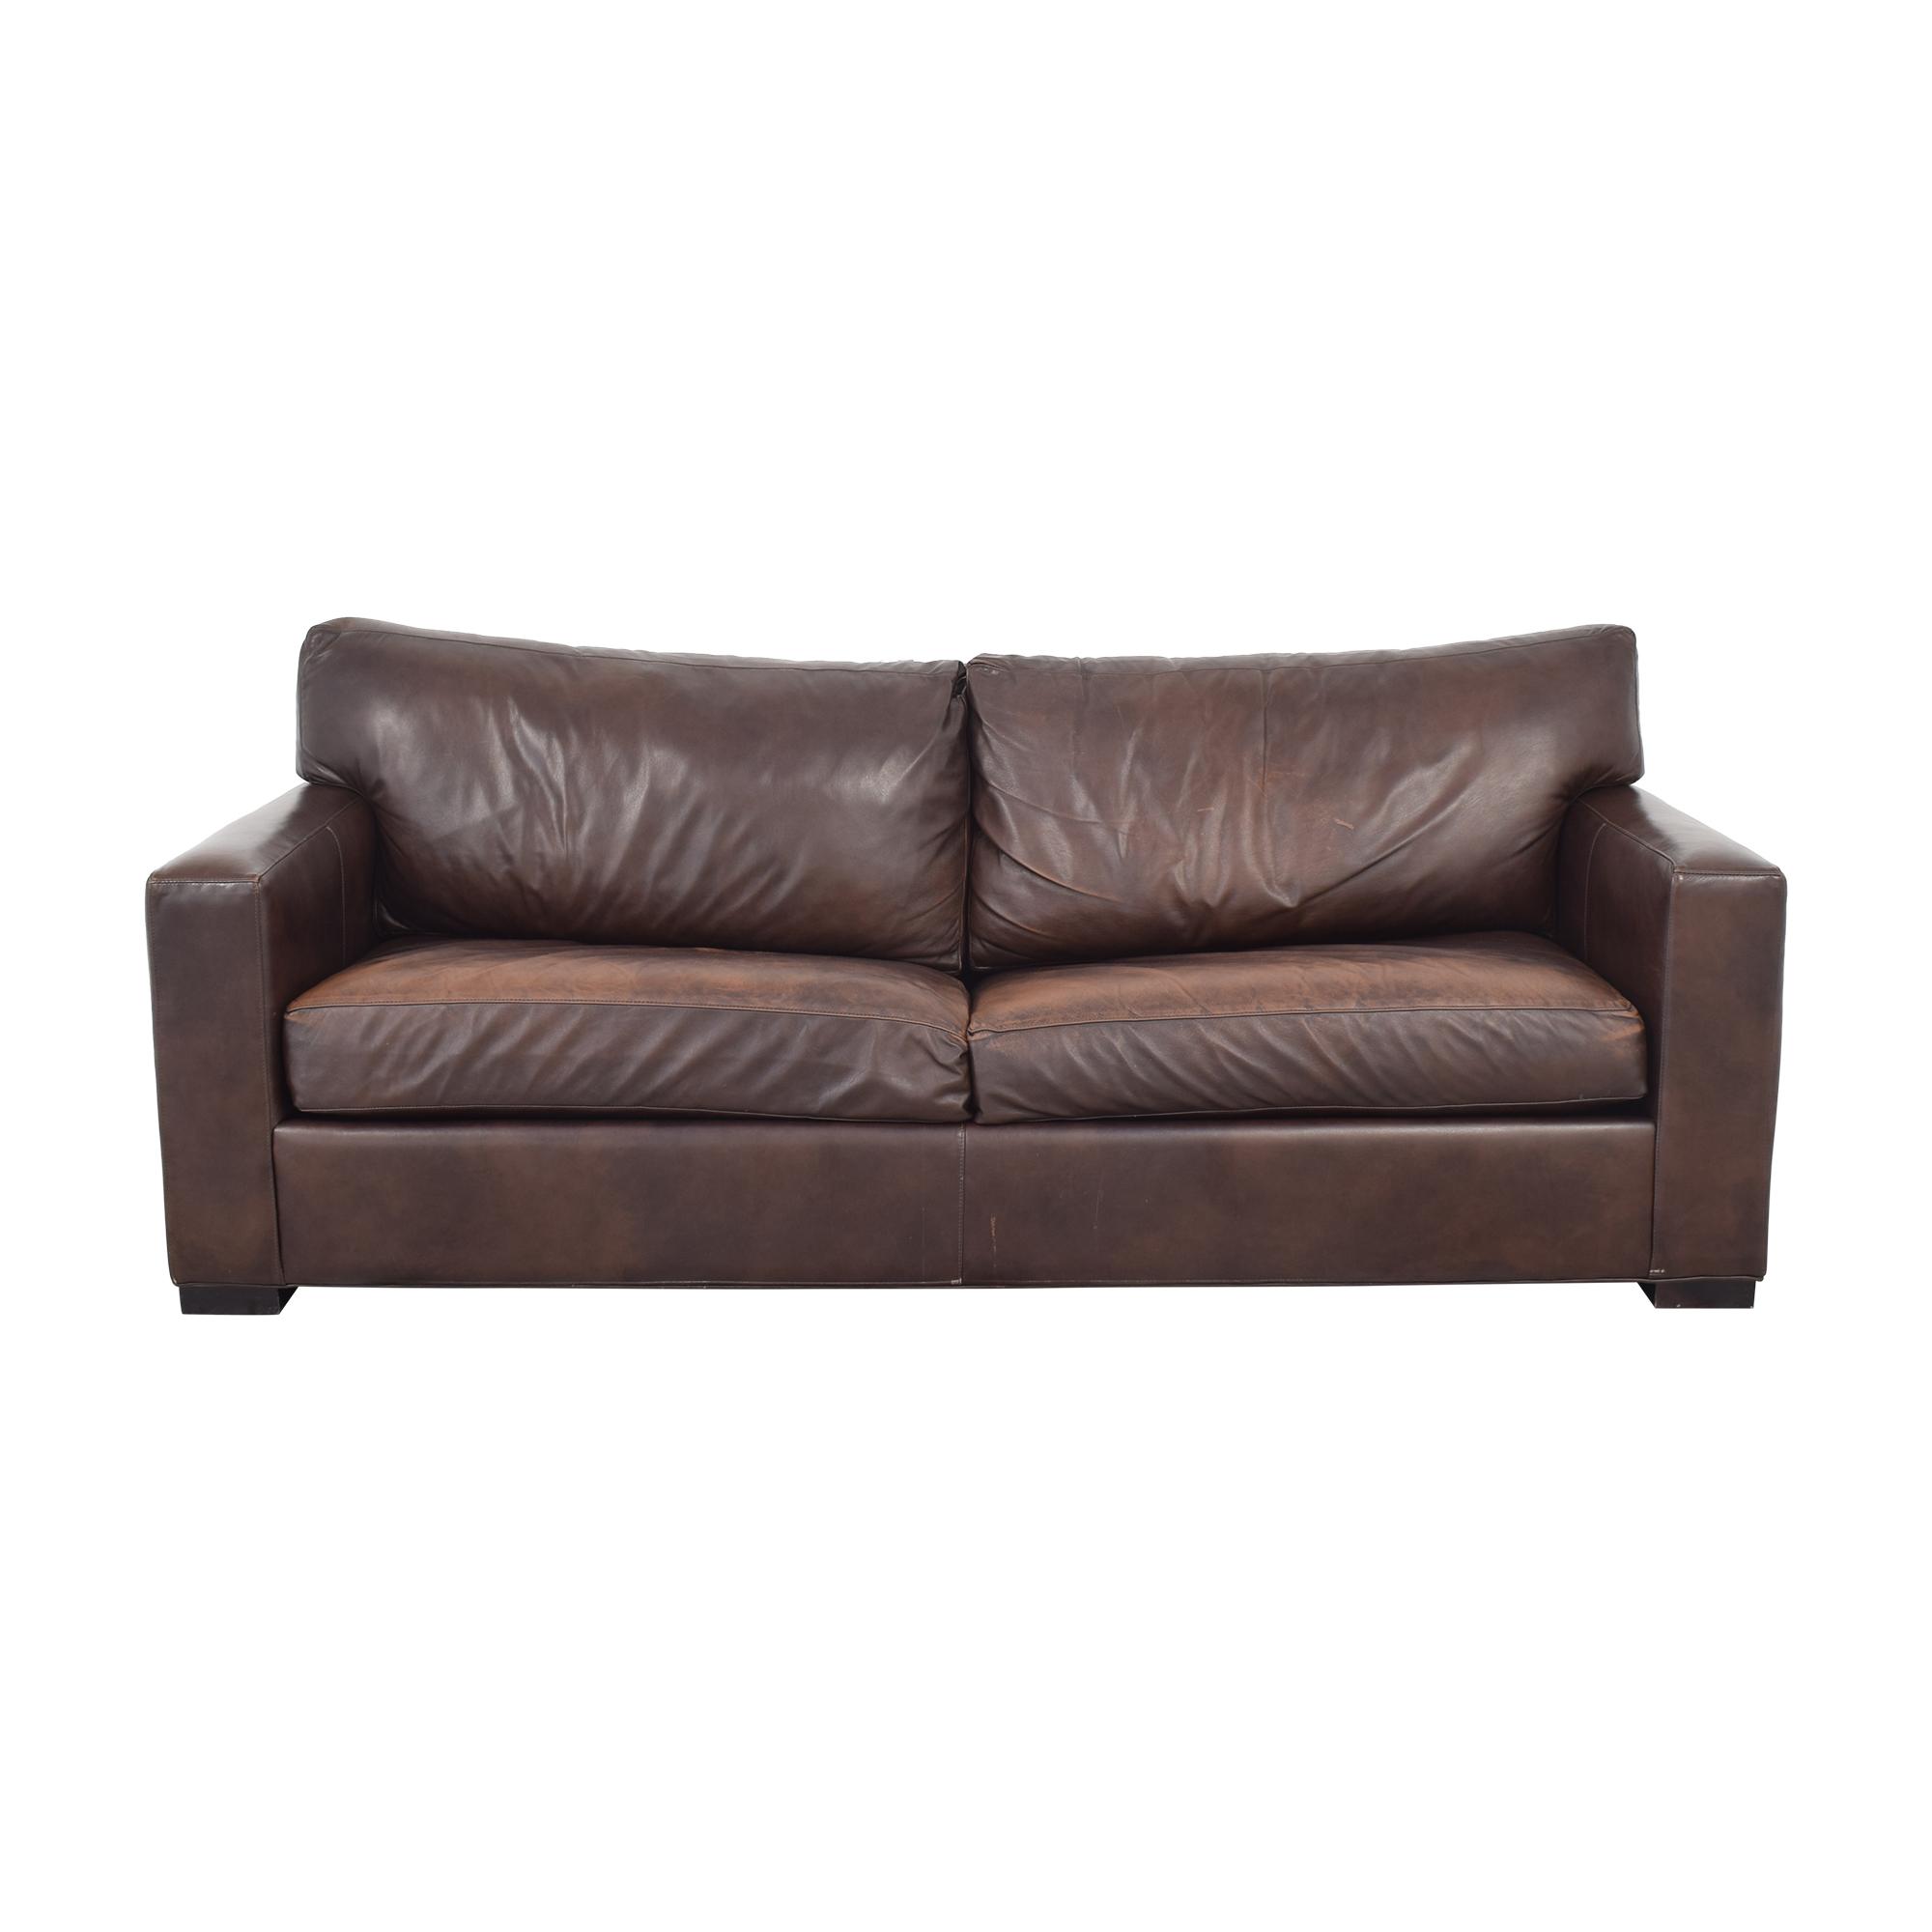 Crate & Barrel Crate & Barrel Axis II Leather Two Seat Queen Sleeper Sofa